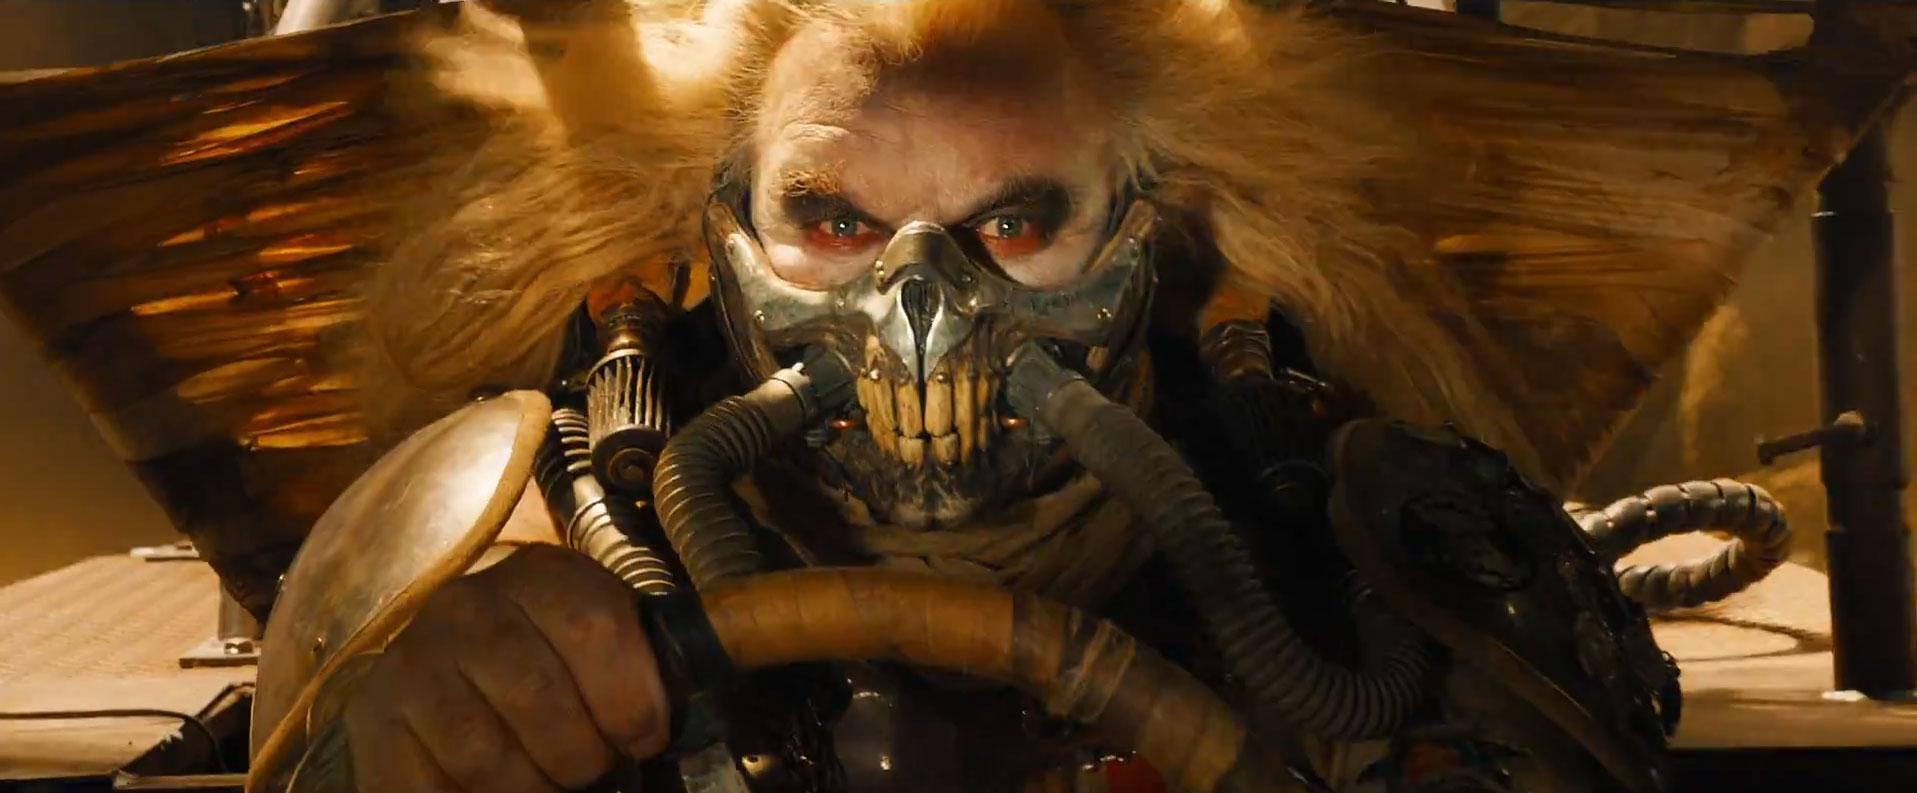 Imortan Joe dans Mad Max : Fury Road